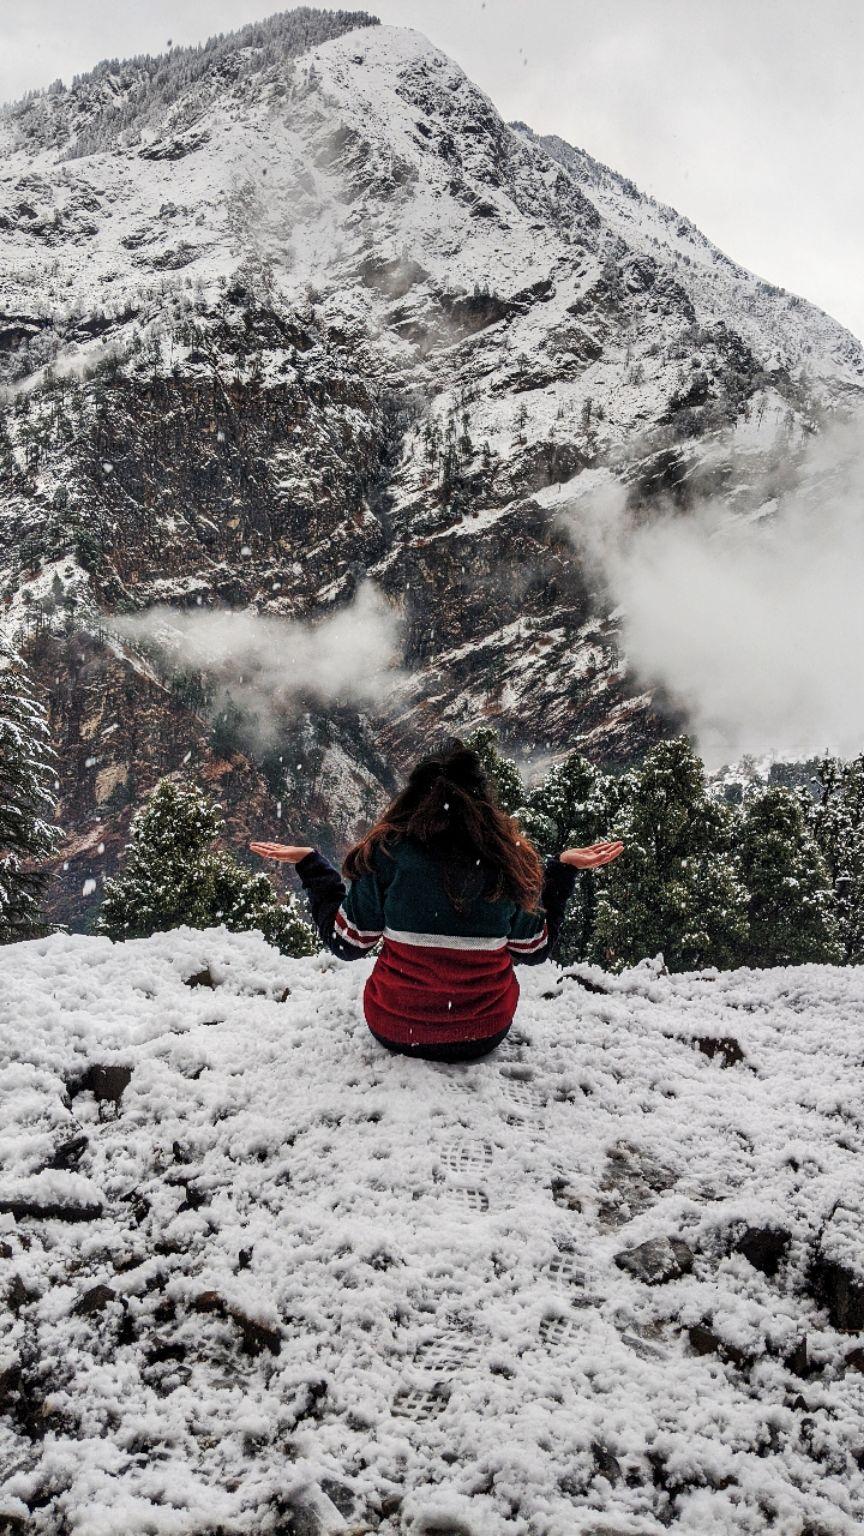 Photo of Kedarkantha Trek By Nayana murthy